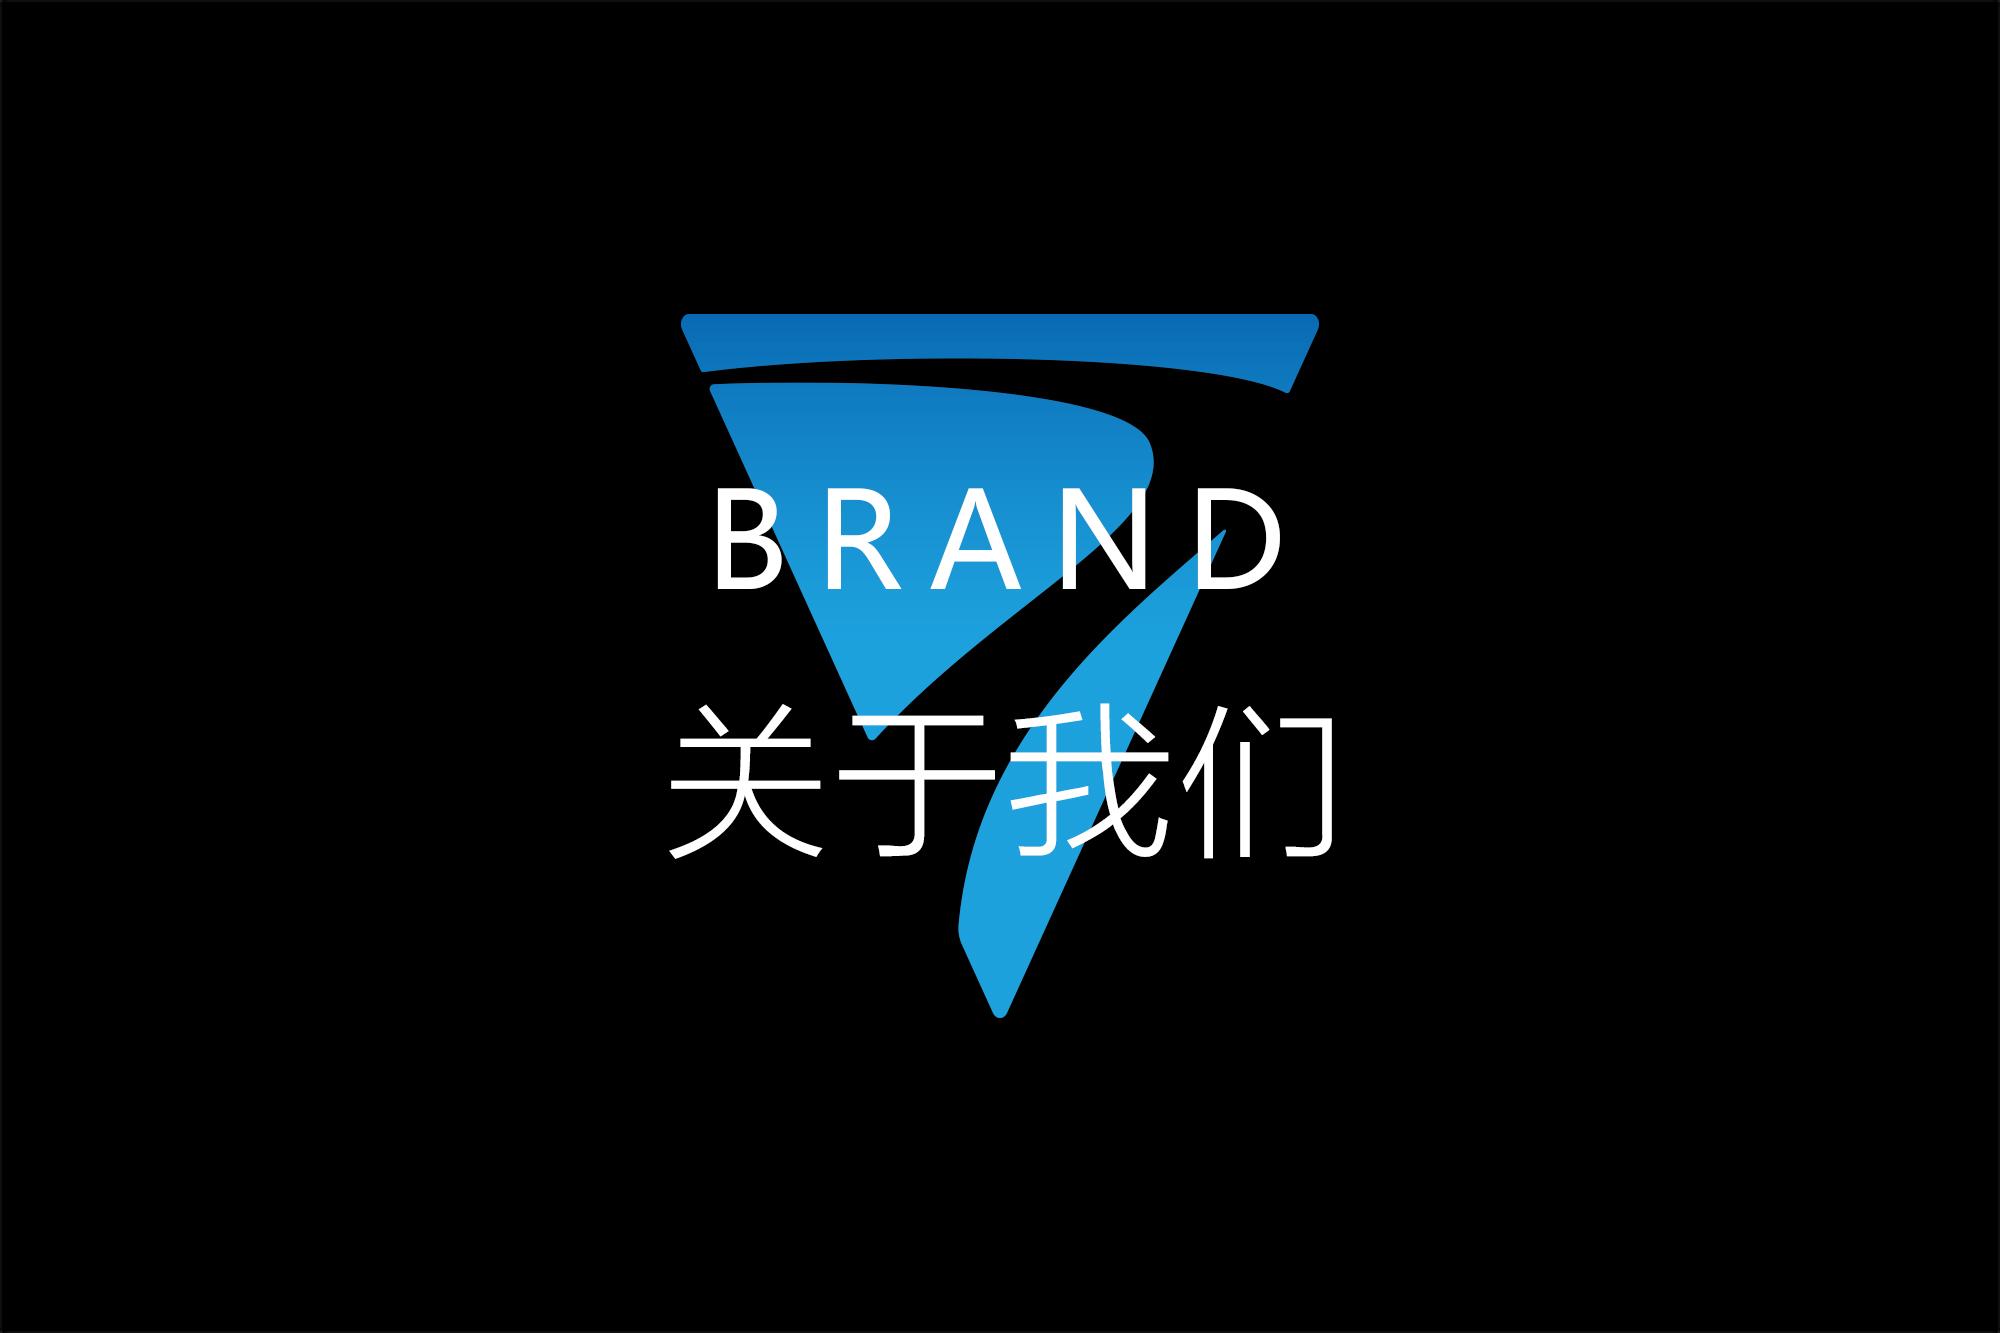 brand-2